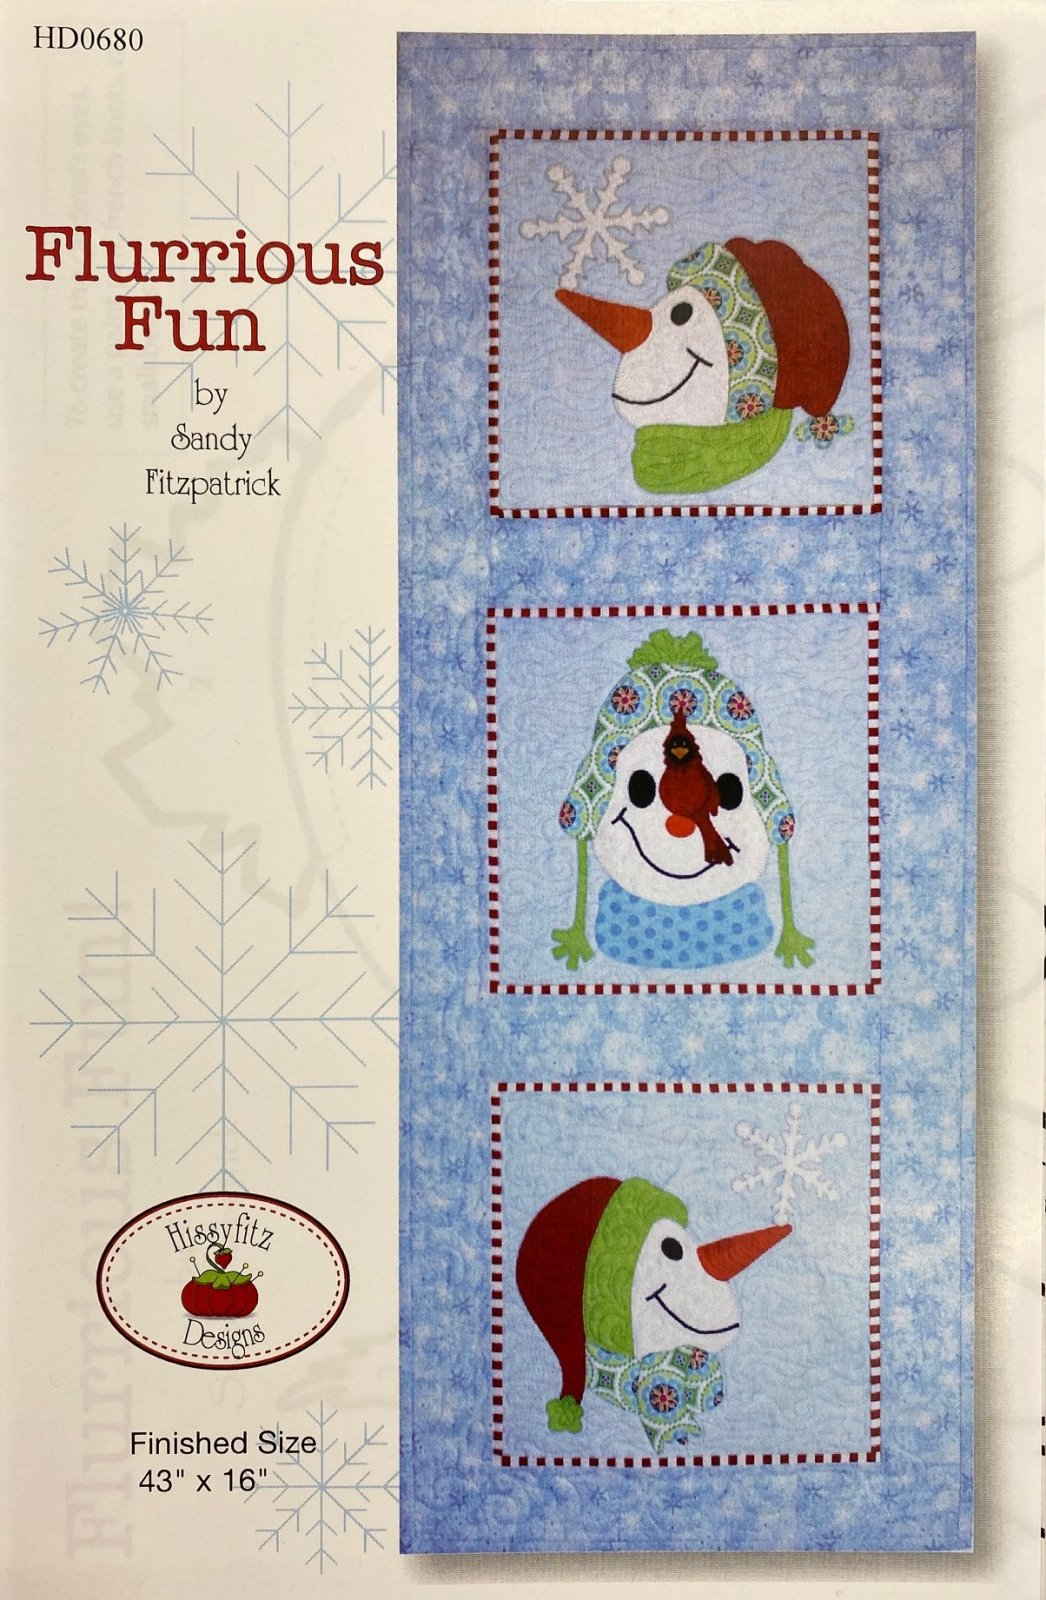 Flurrious Fun by Hissyfitz Designs